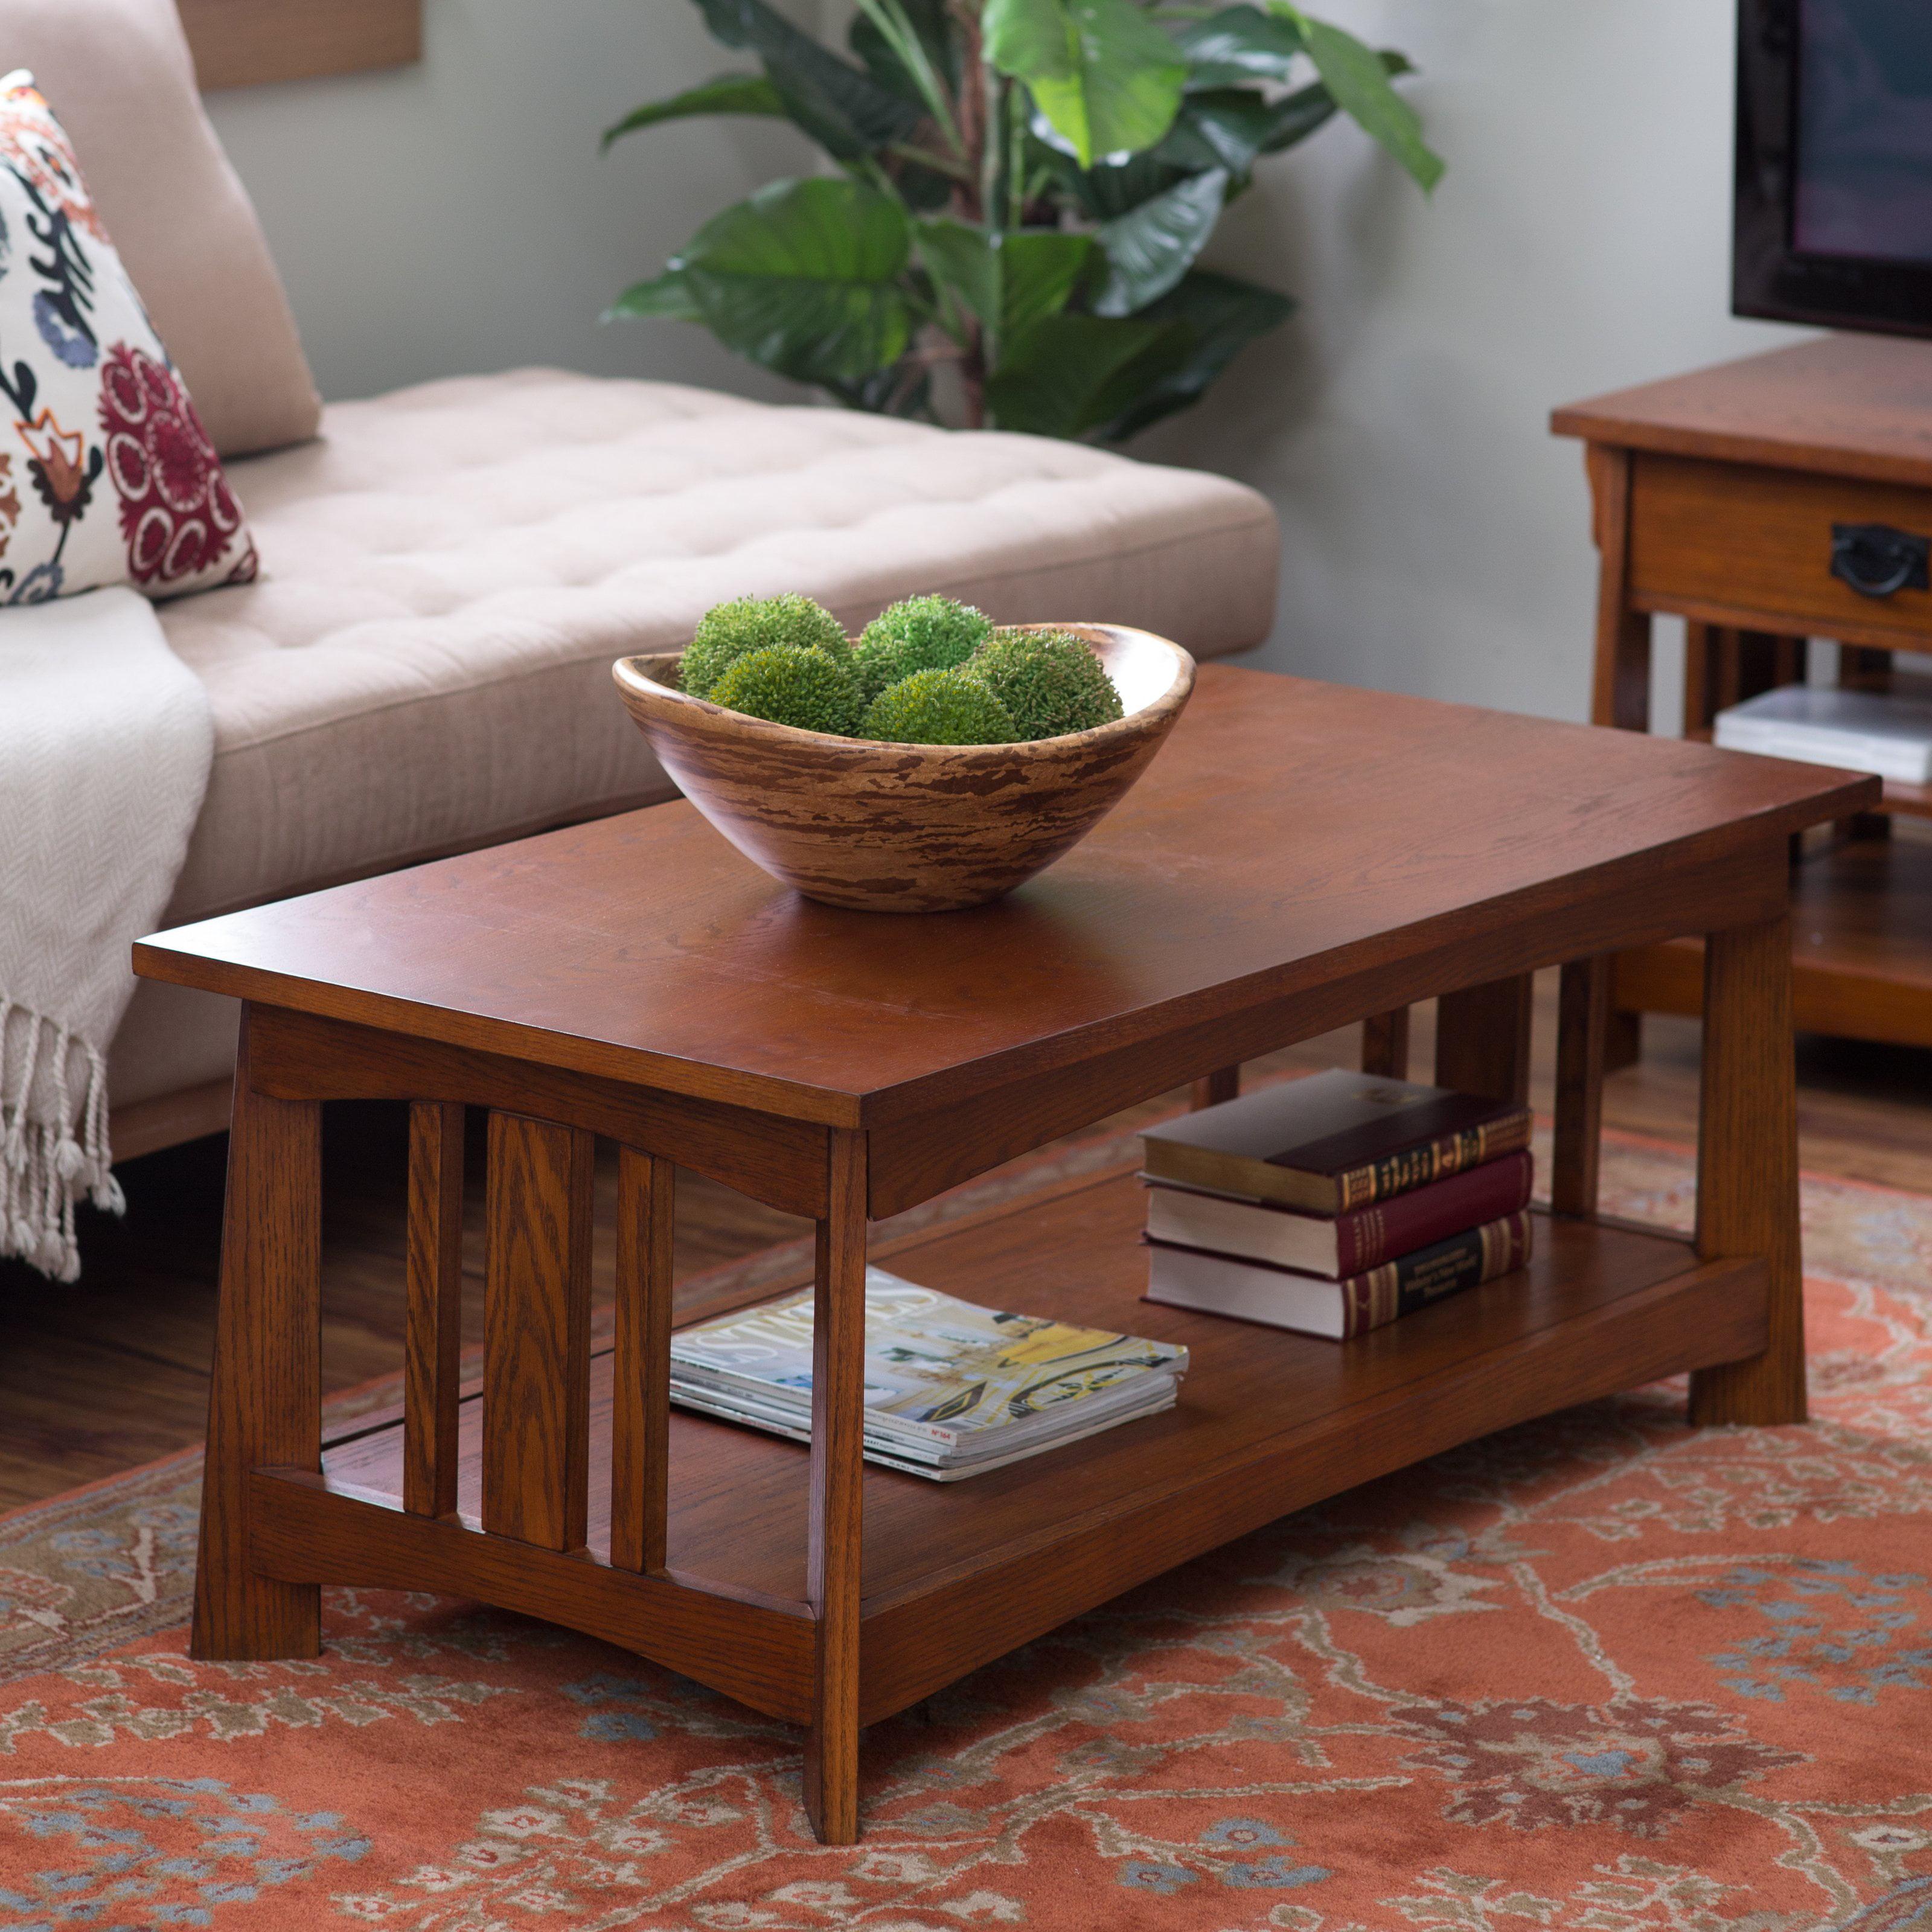 Belham living everett mission coffee table walmart geotapseo Images